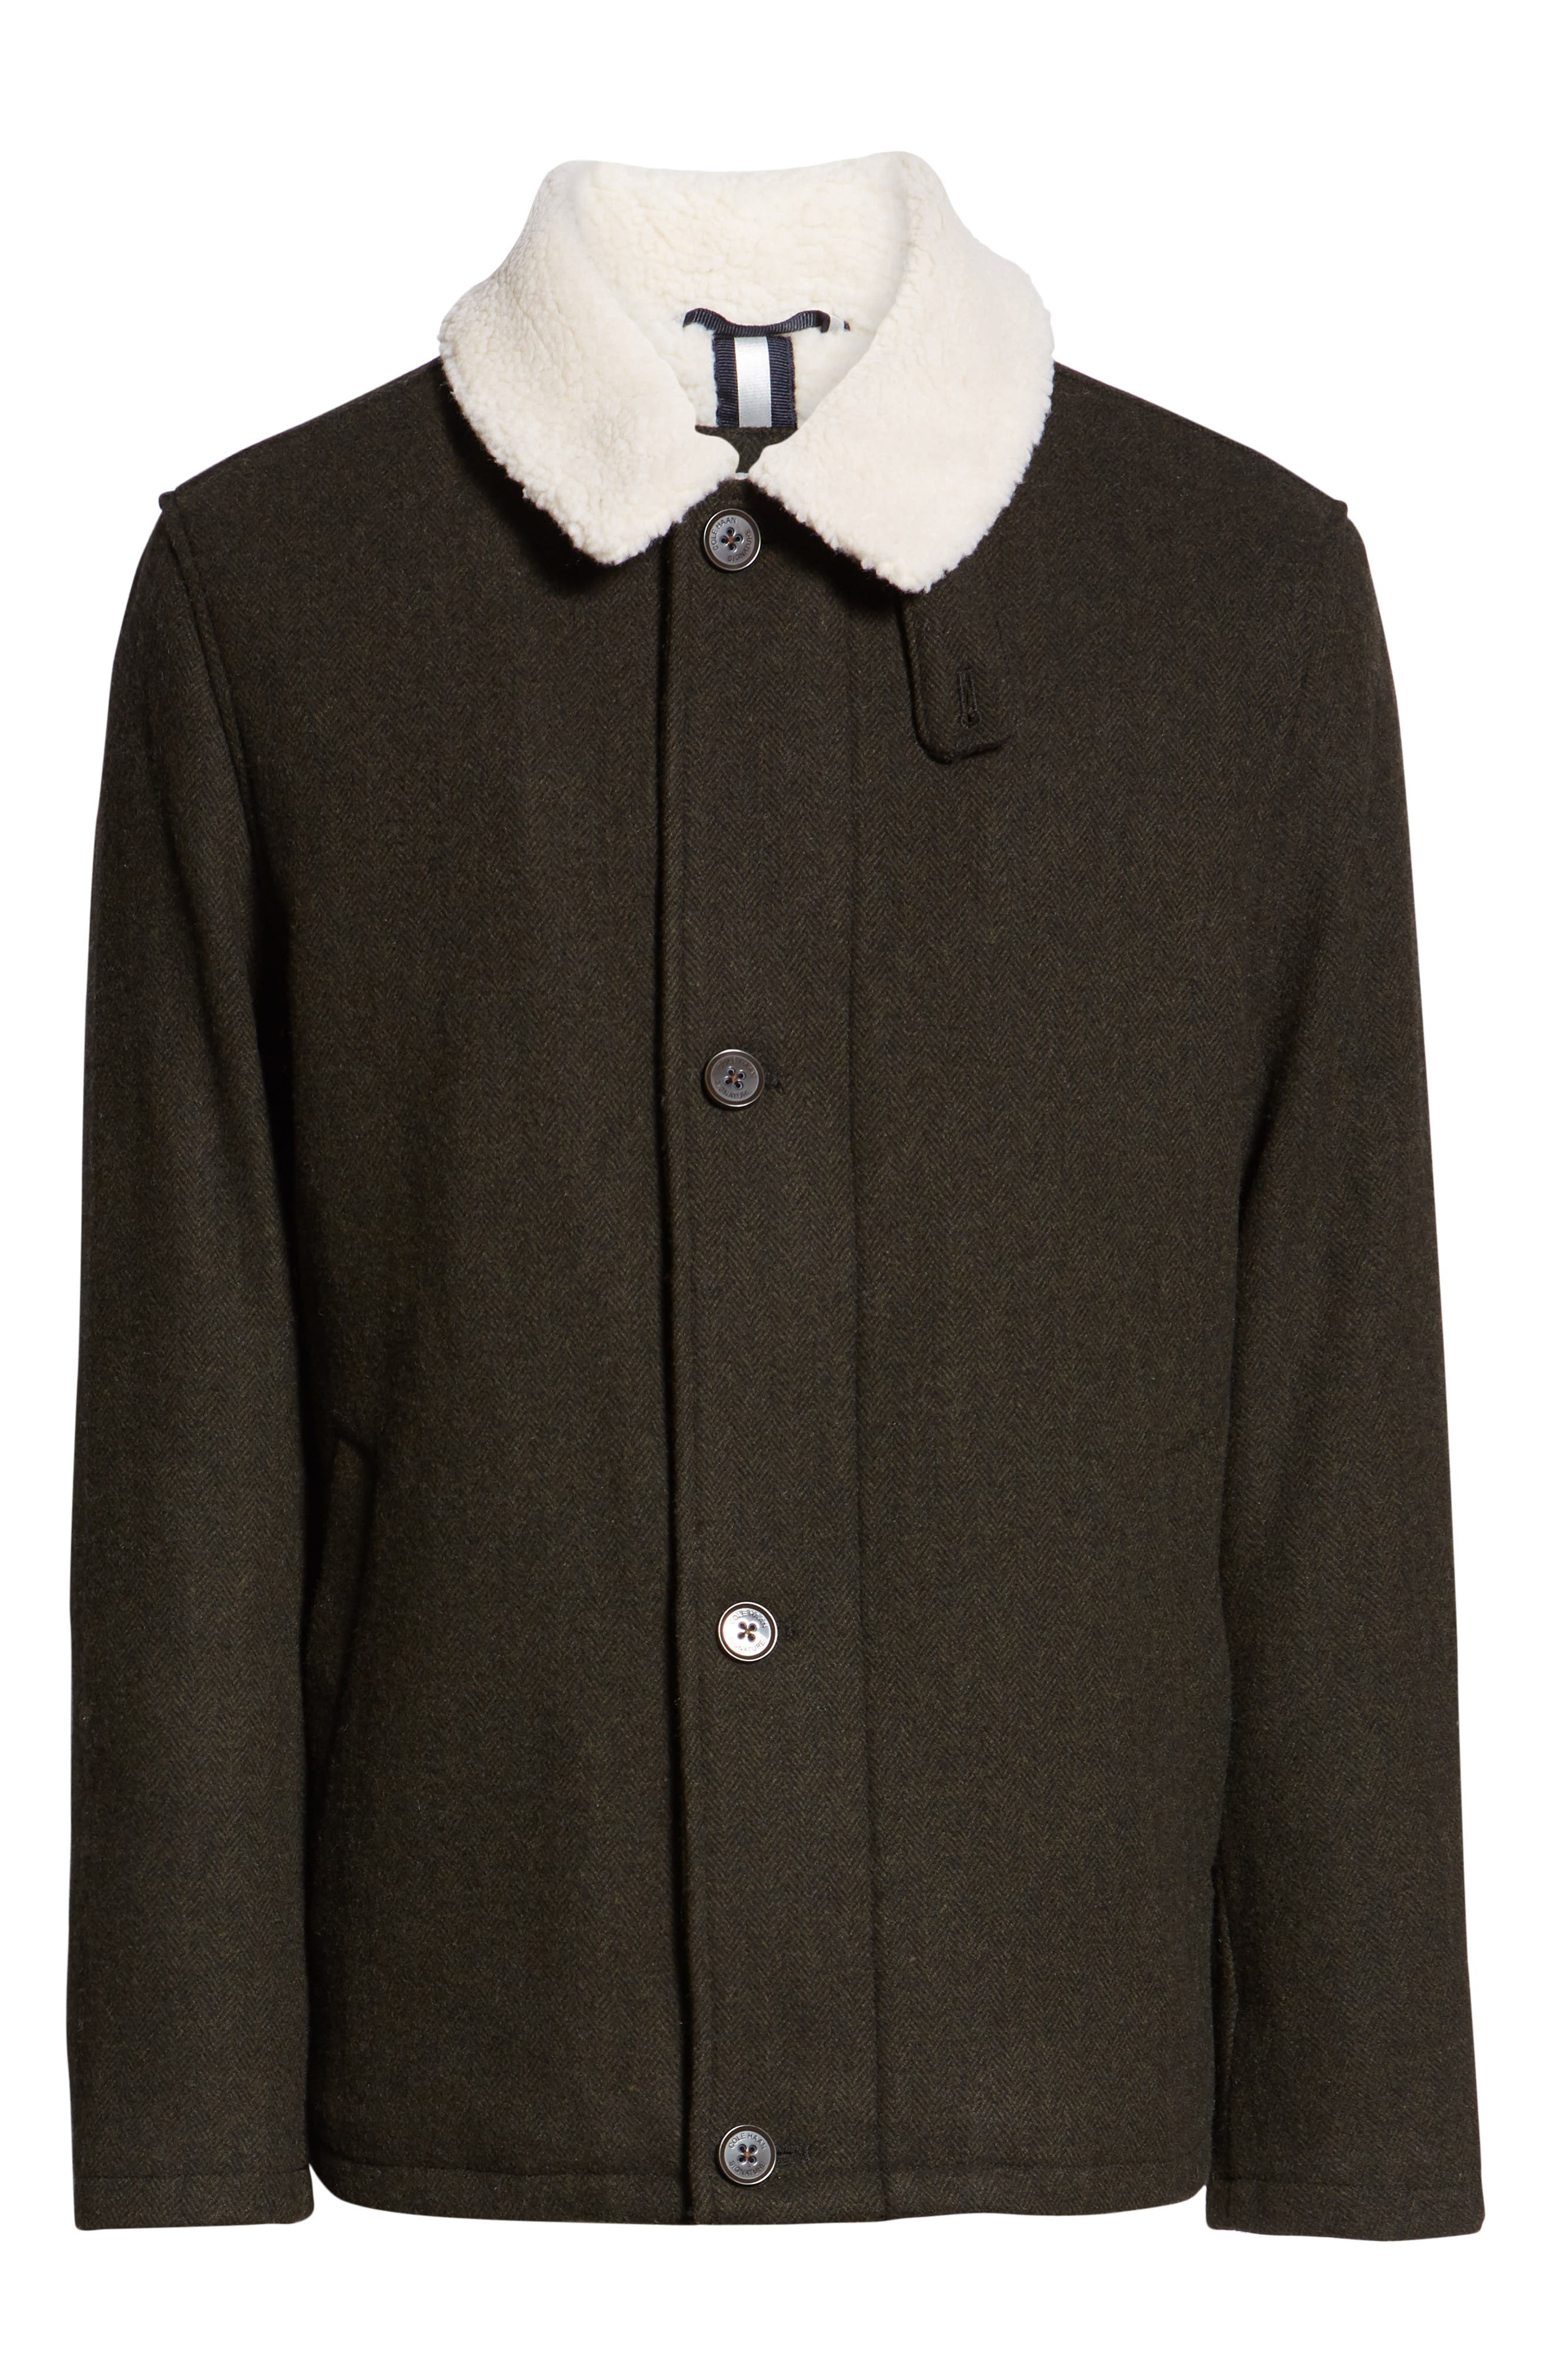 COLE HAAN SIGNATURE,                             Faux Shearling Trim Field Jacket,                             Alternate thumbnail 6, color,                             317